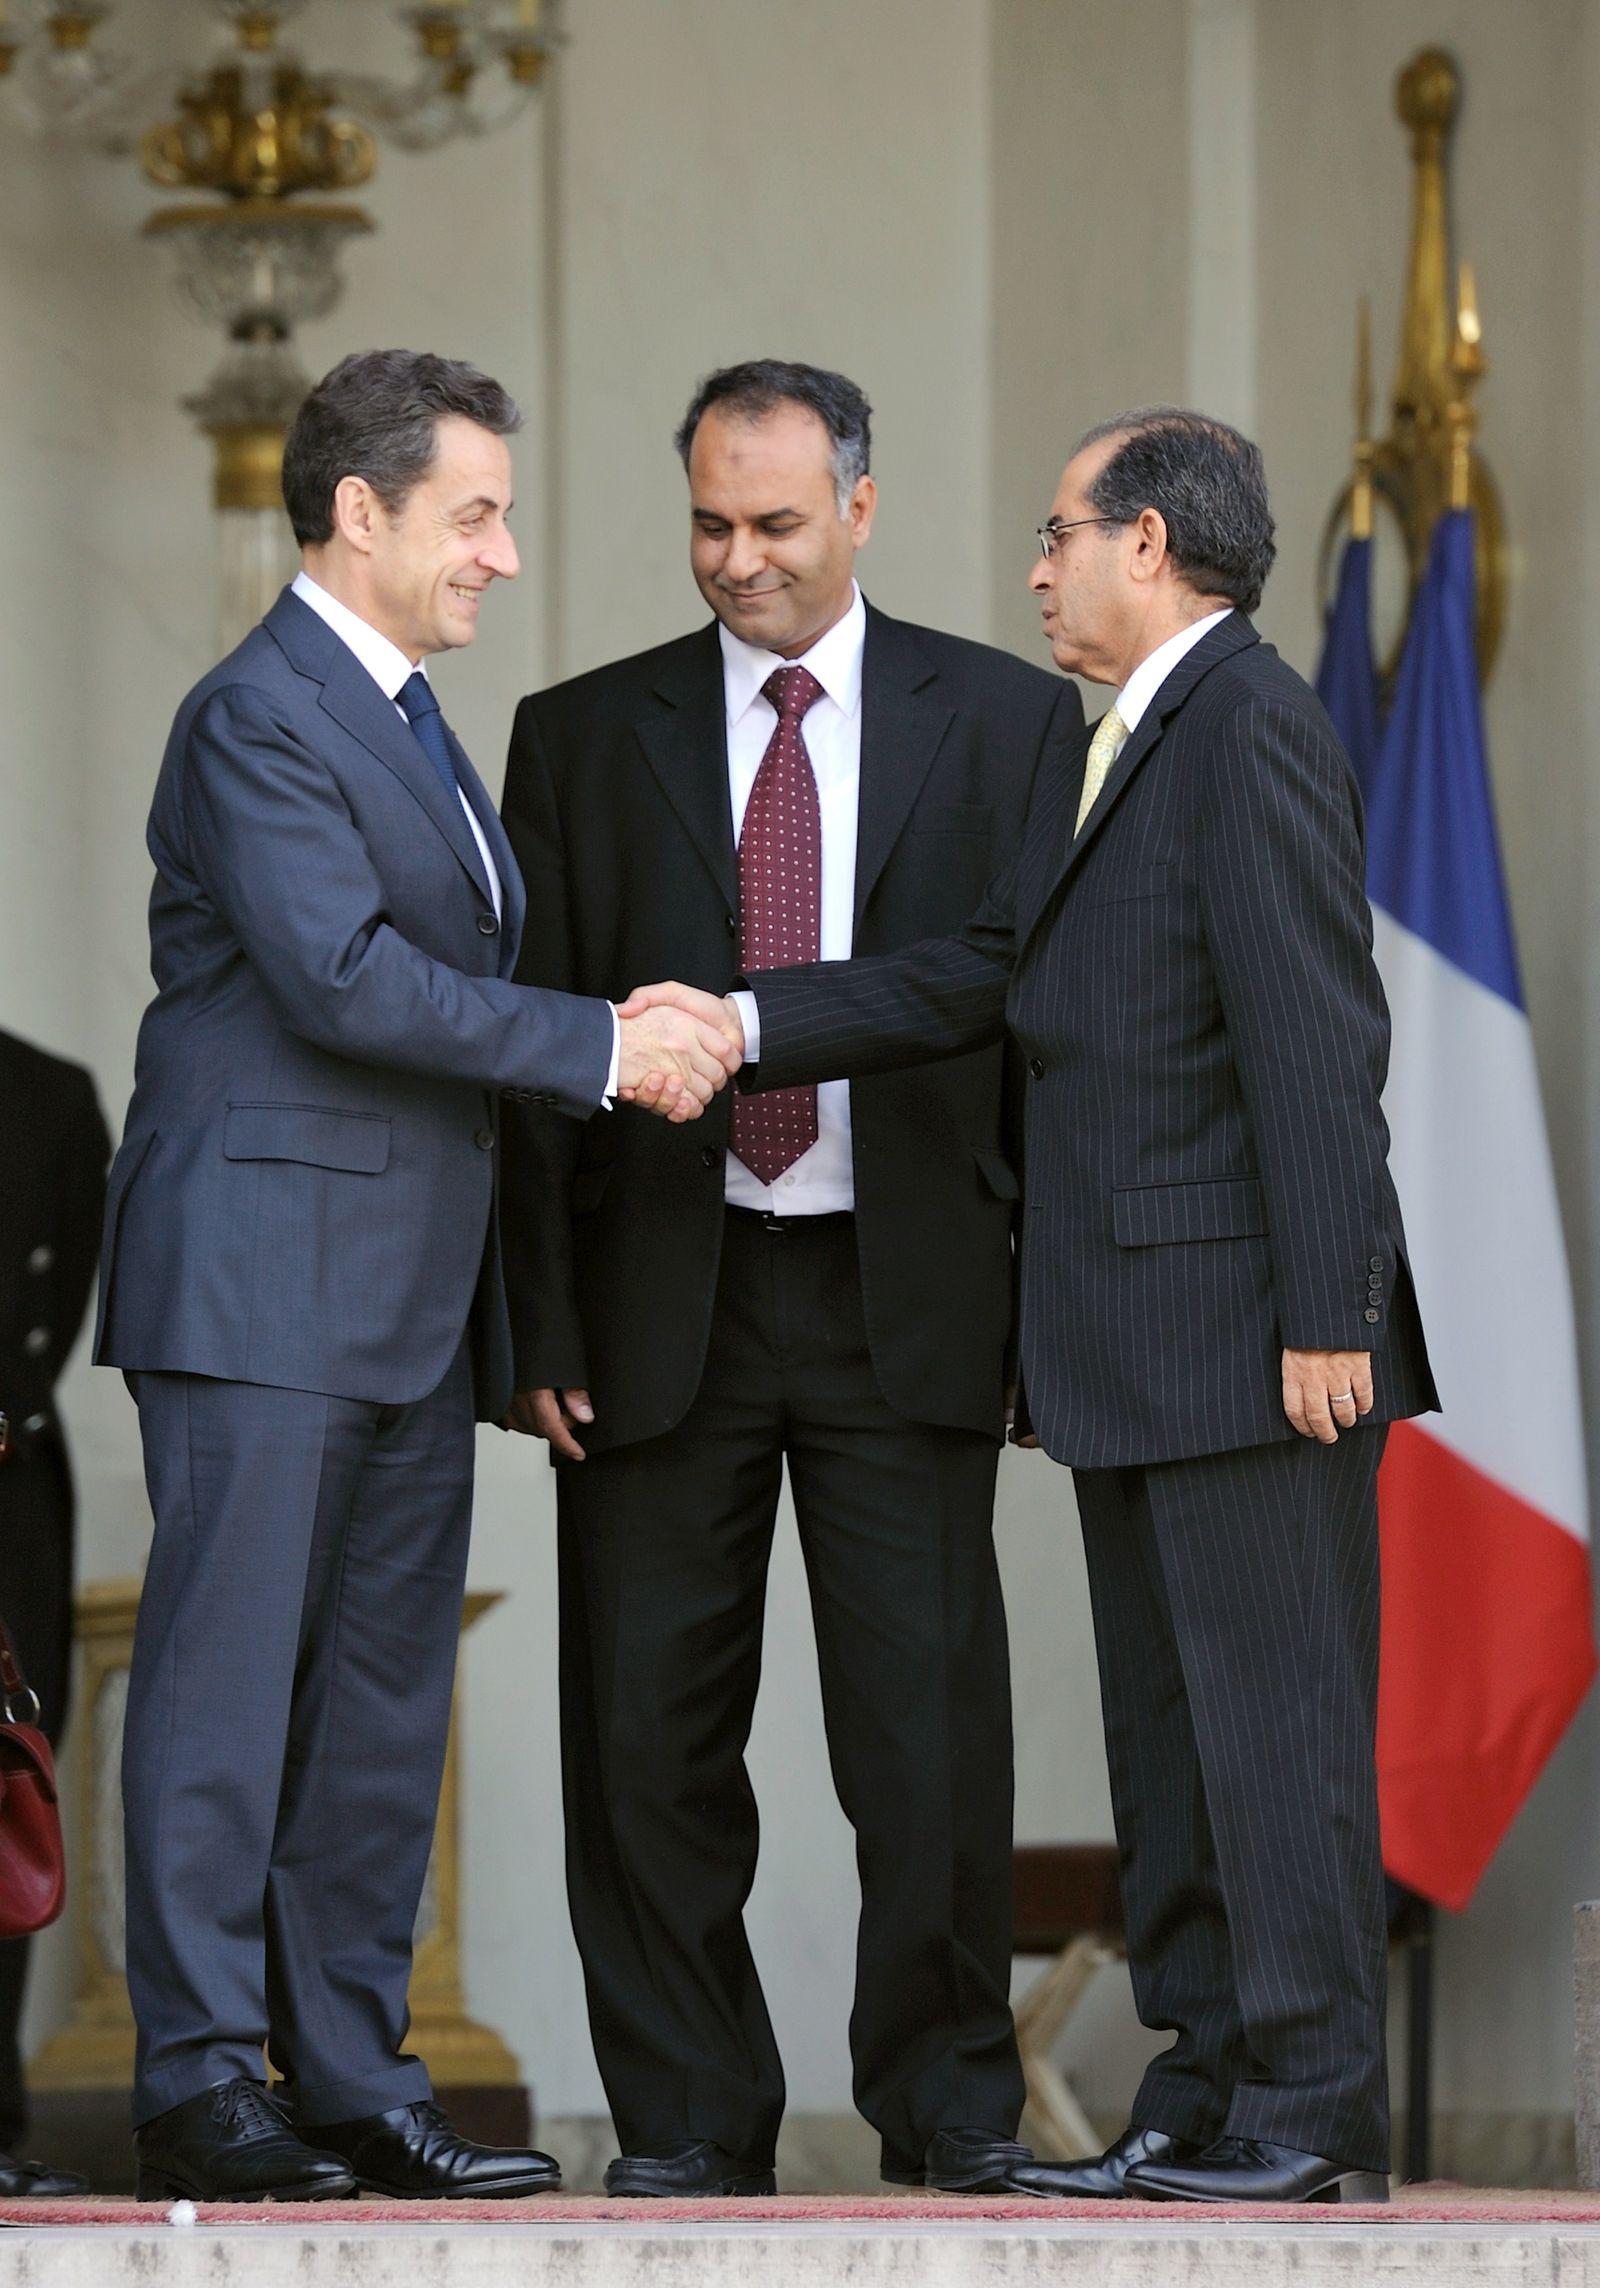 FRANCE-LIBYA-POLITICS-UNREST-DIPLOMACY